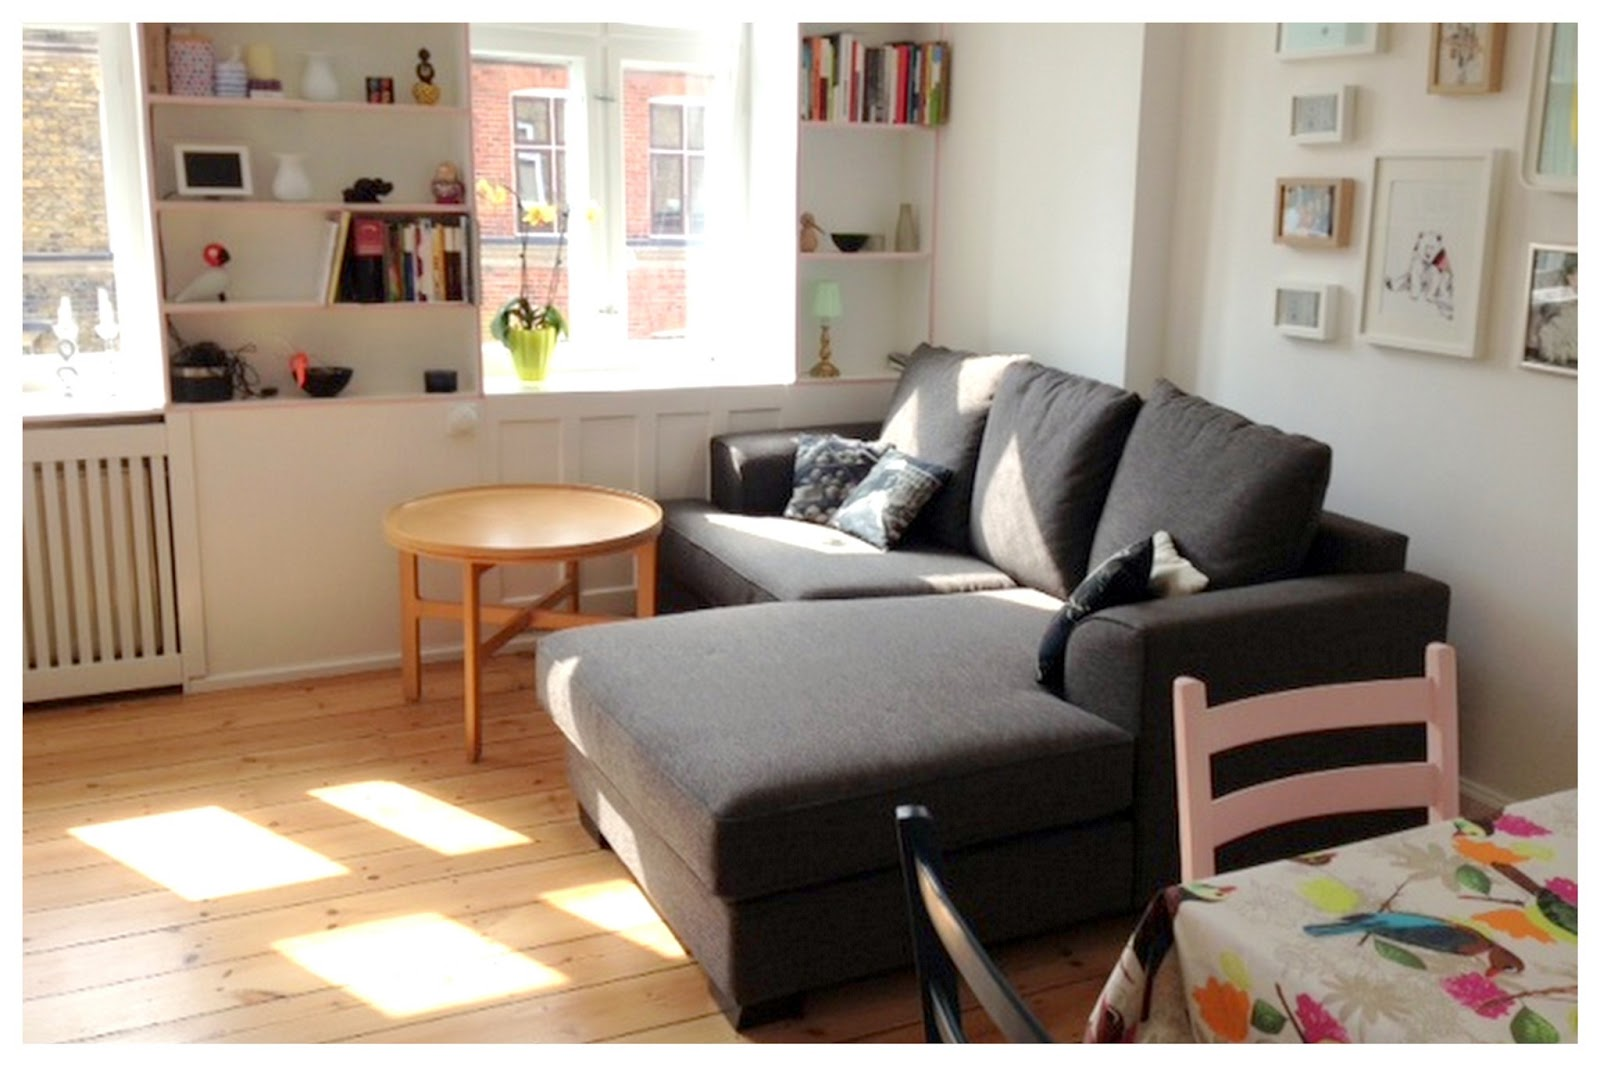 Camomilla: min stue er forandret...